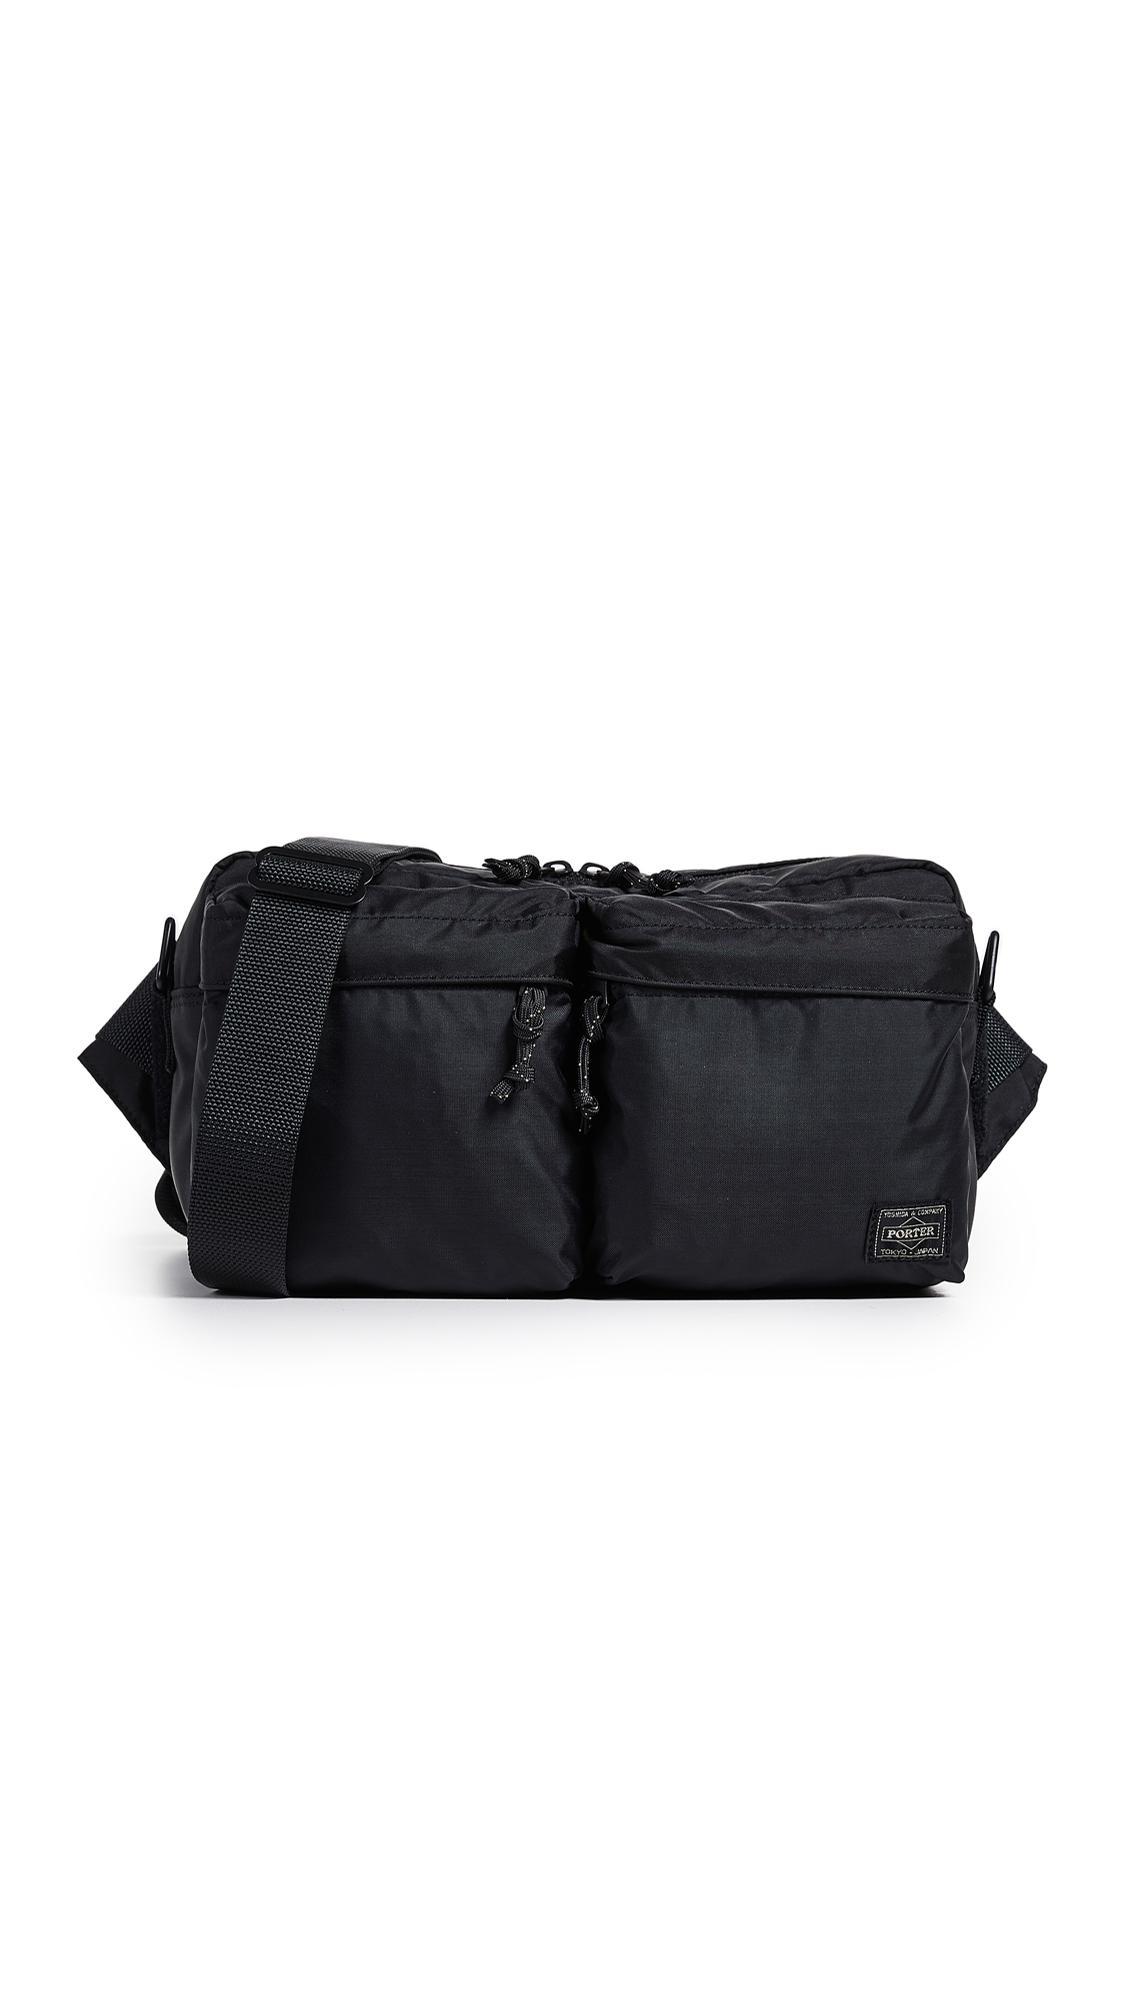 b041e4dd0ec8 Porter Force 2-way Waist Bag in Black for Men - Lyst